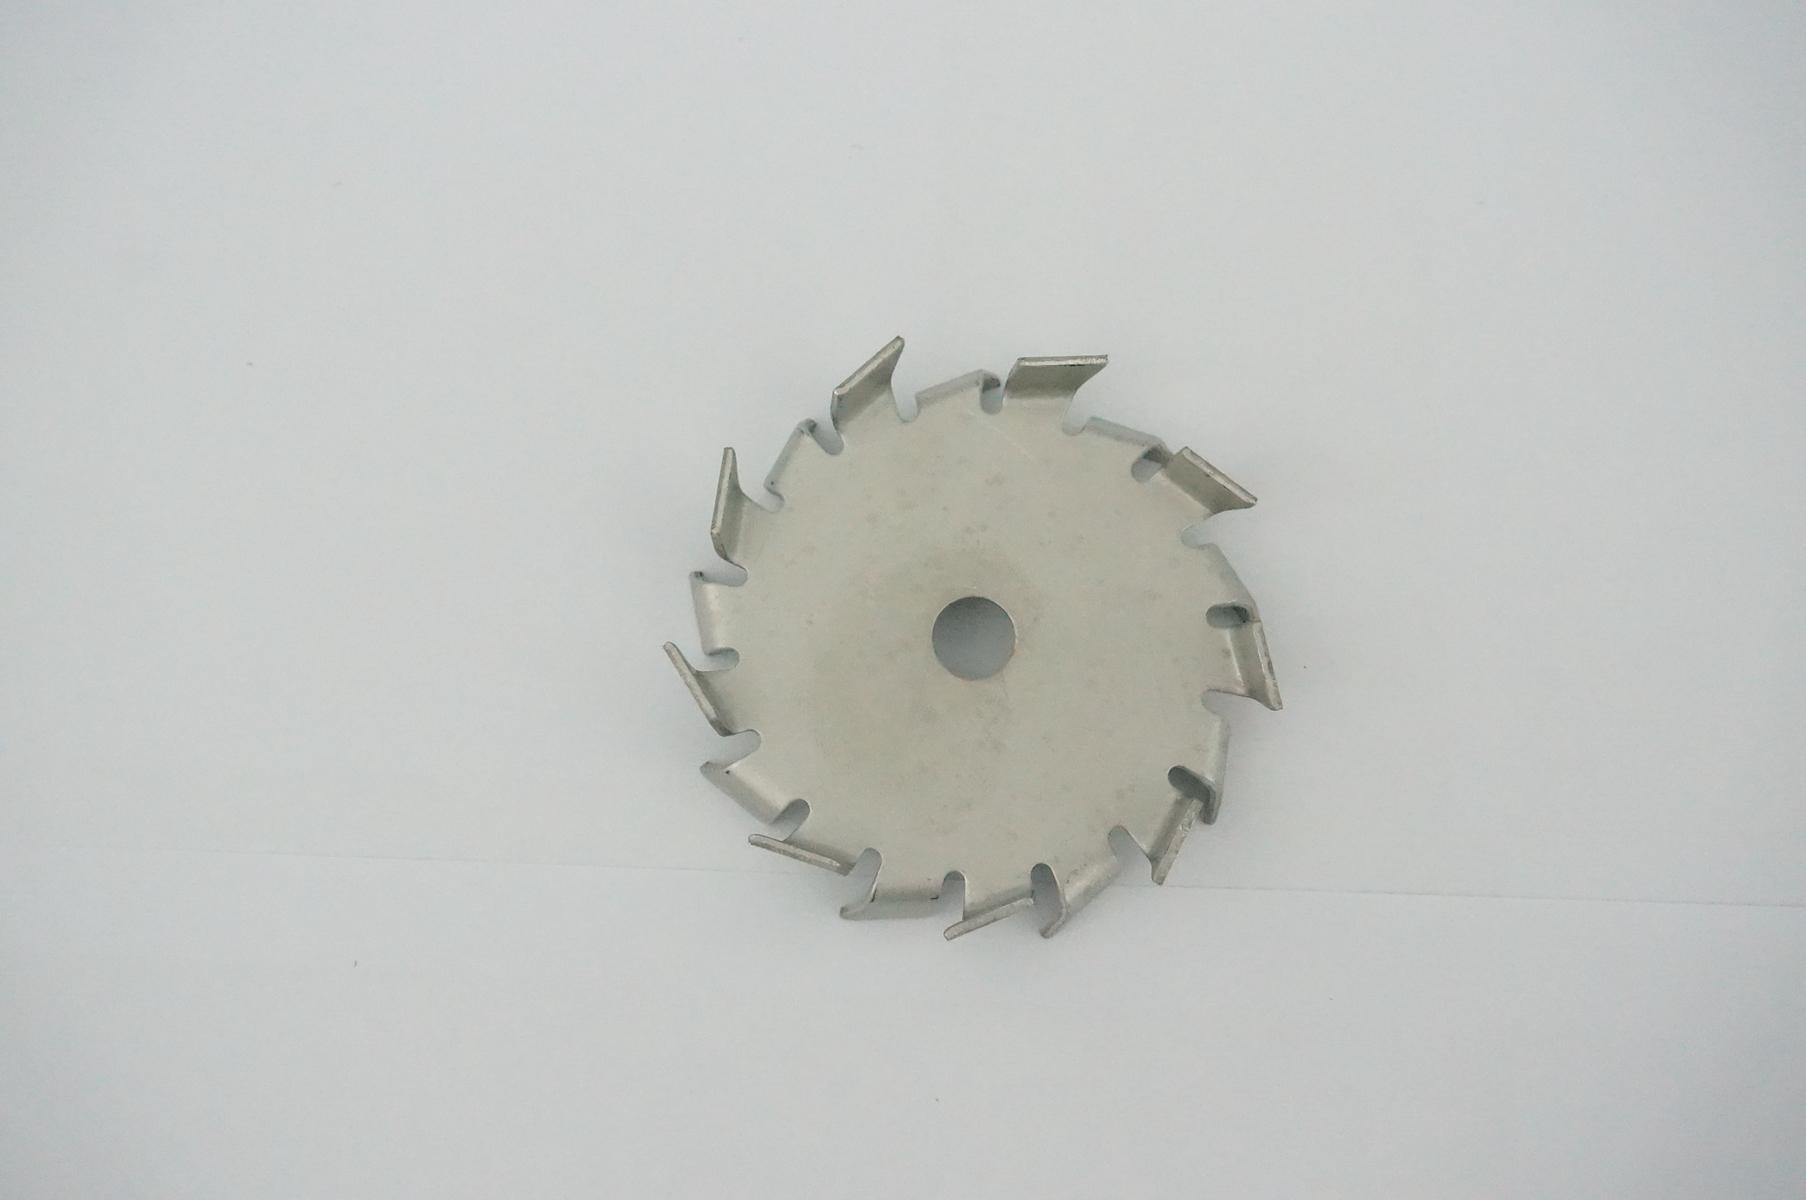 35mm 350mm Stainless Steel Stir Blade Impeller Tooth Type Dispersed Disc Gear